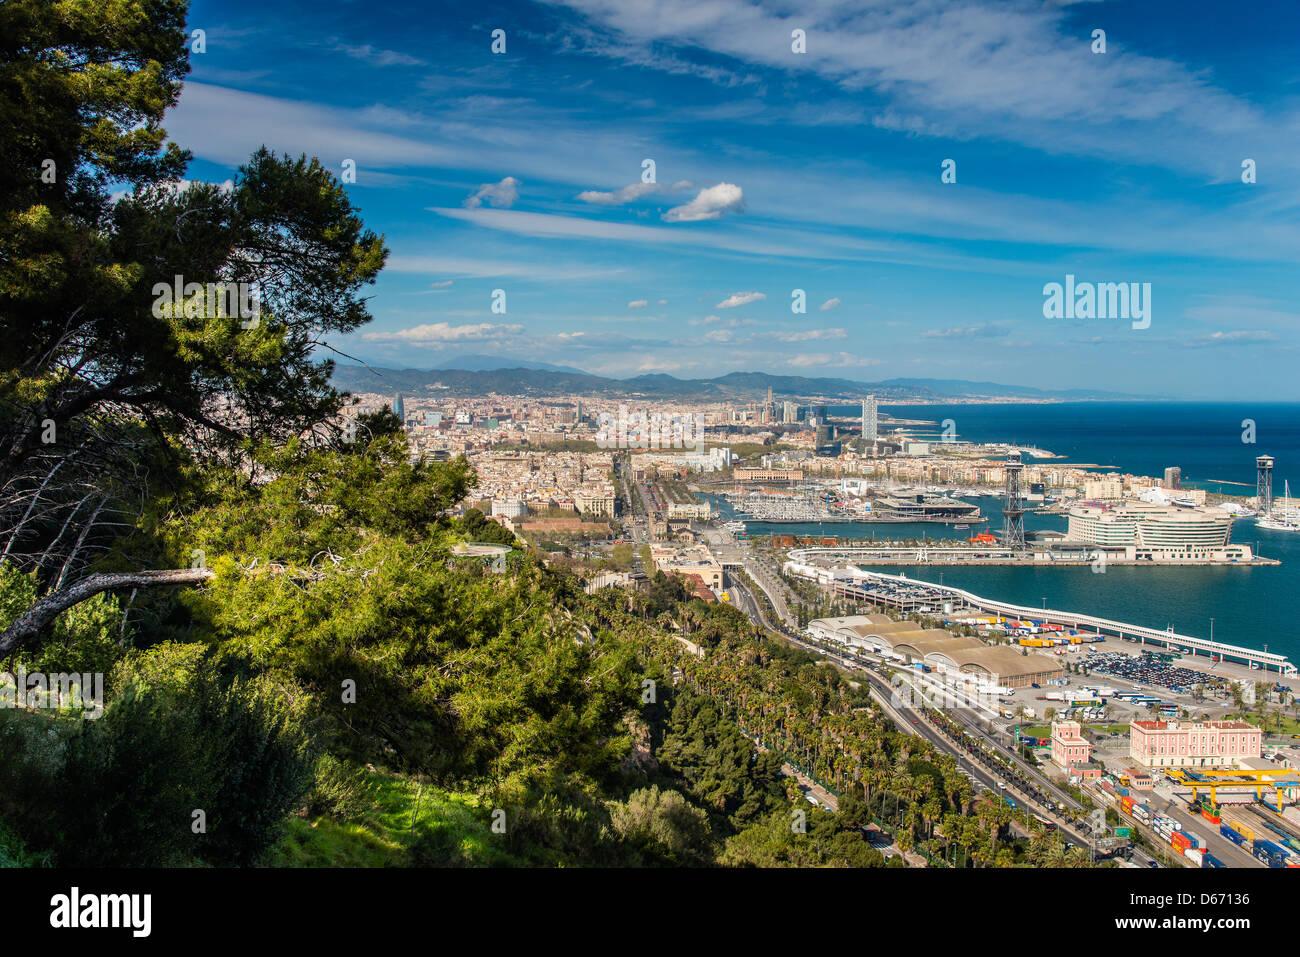 City skyline from Montjuïc, Barcelona, Catalonia, Spain - Stock Image